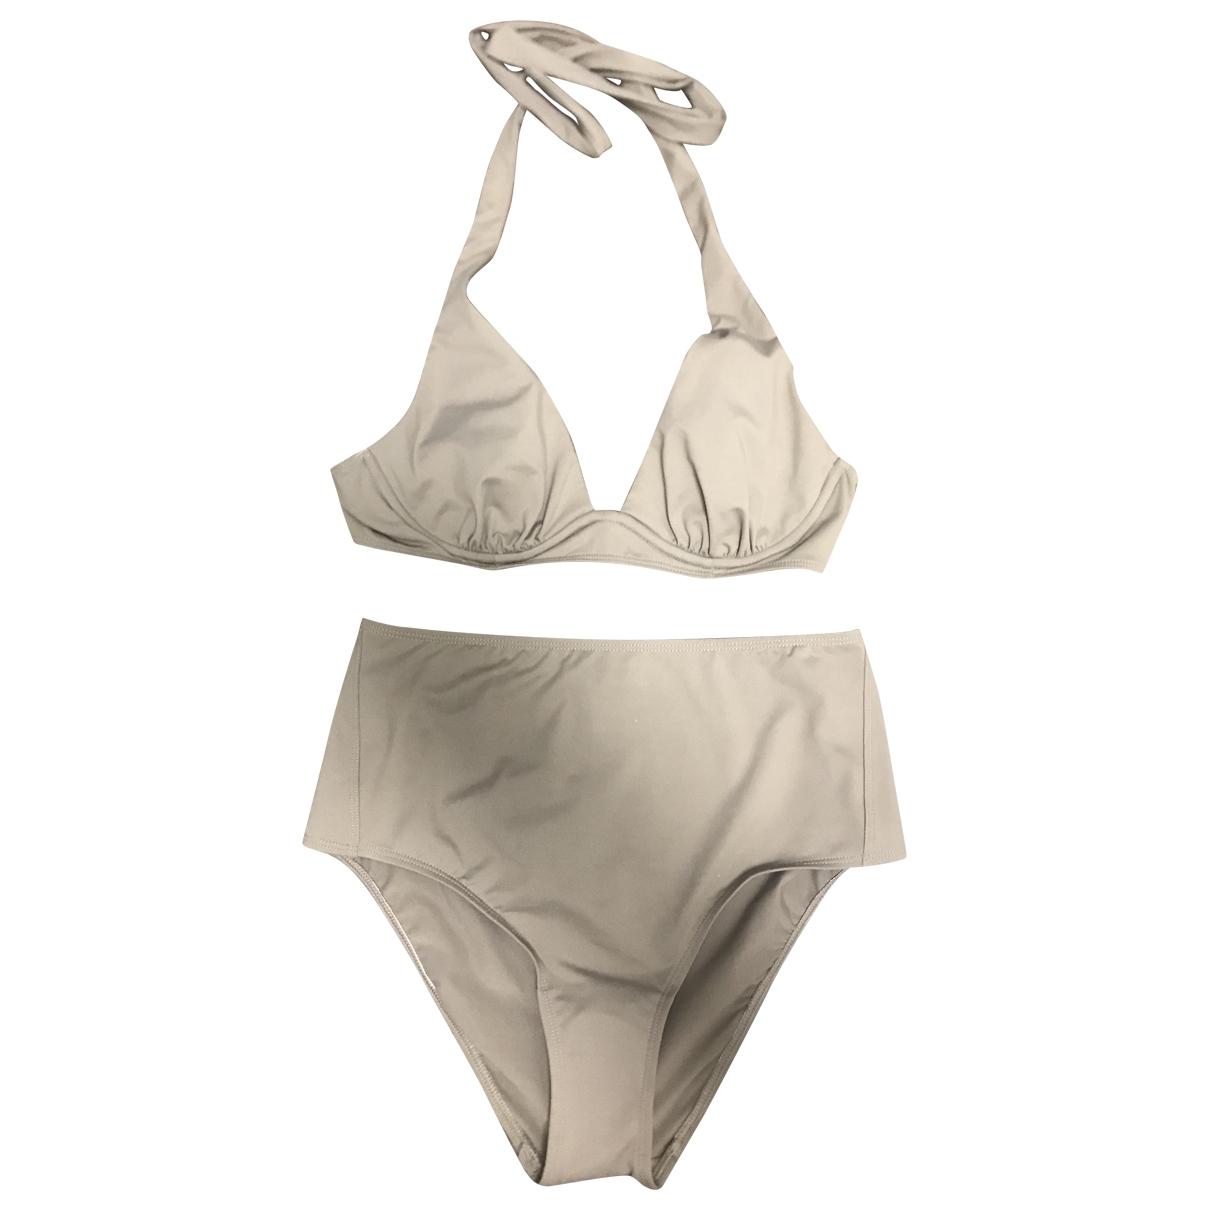 Intrend \N \N Polyamide Swimwear for Women \N